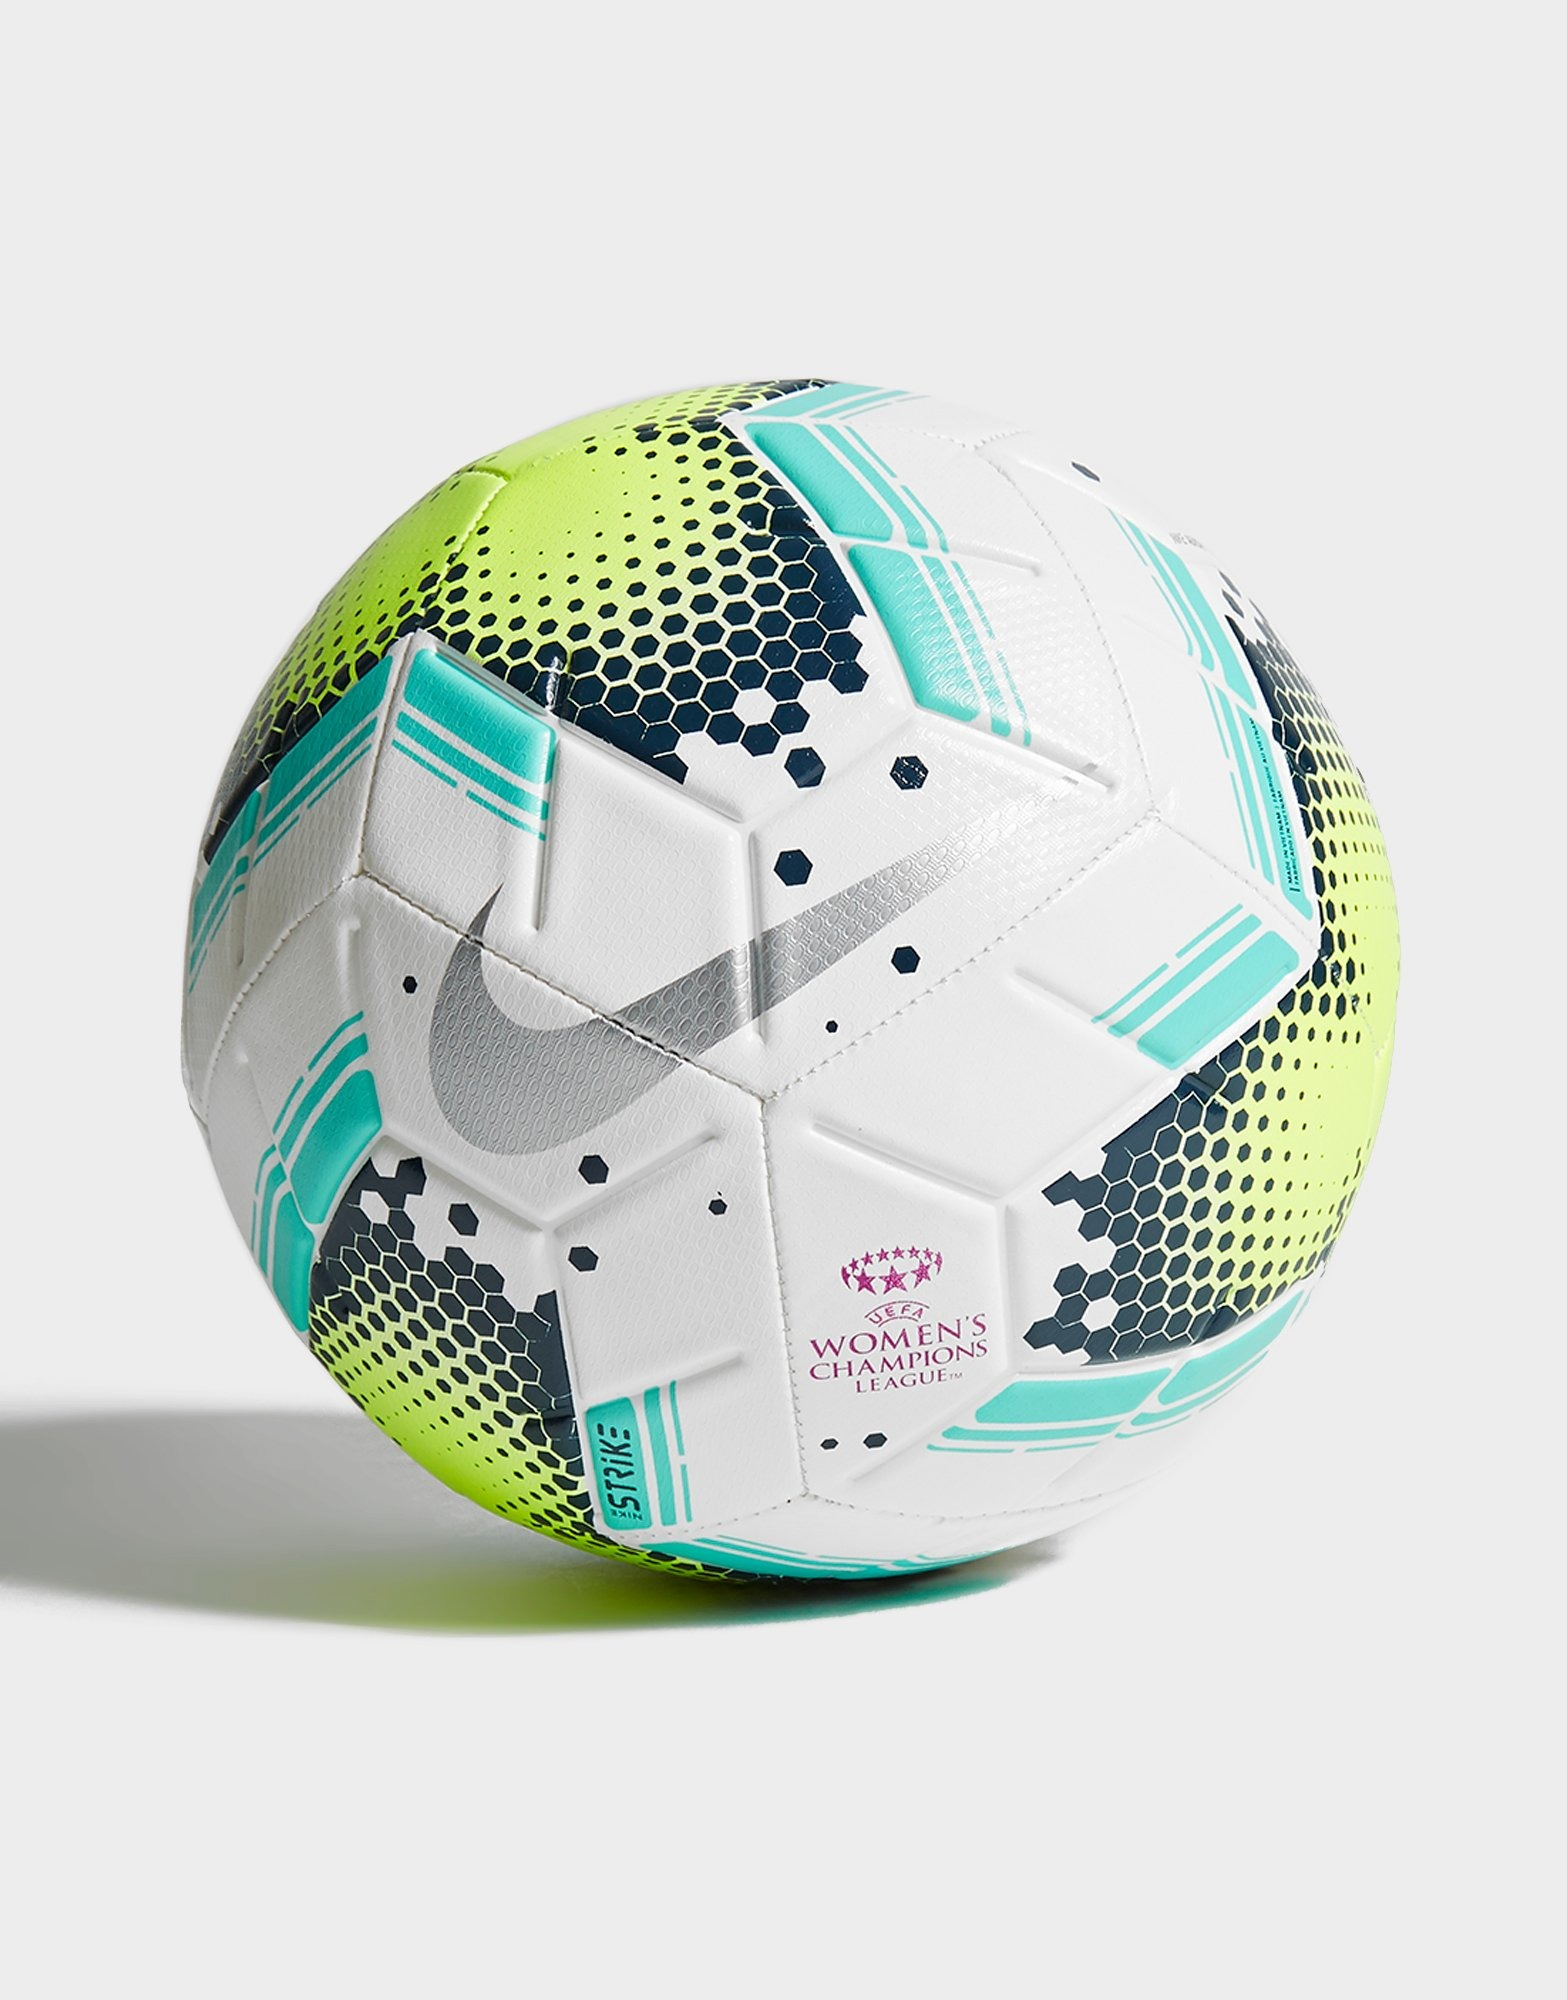 Nike Bola de futebol Women's Champions League 20 Strike | JD Sports